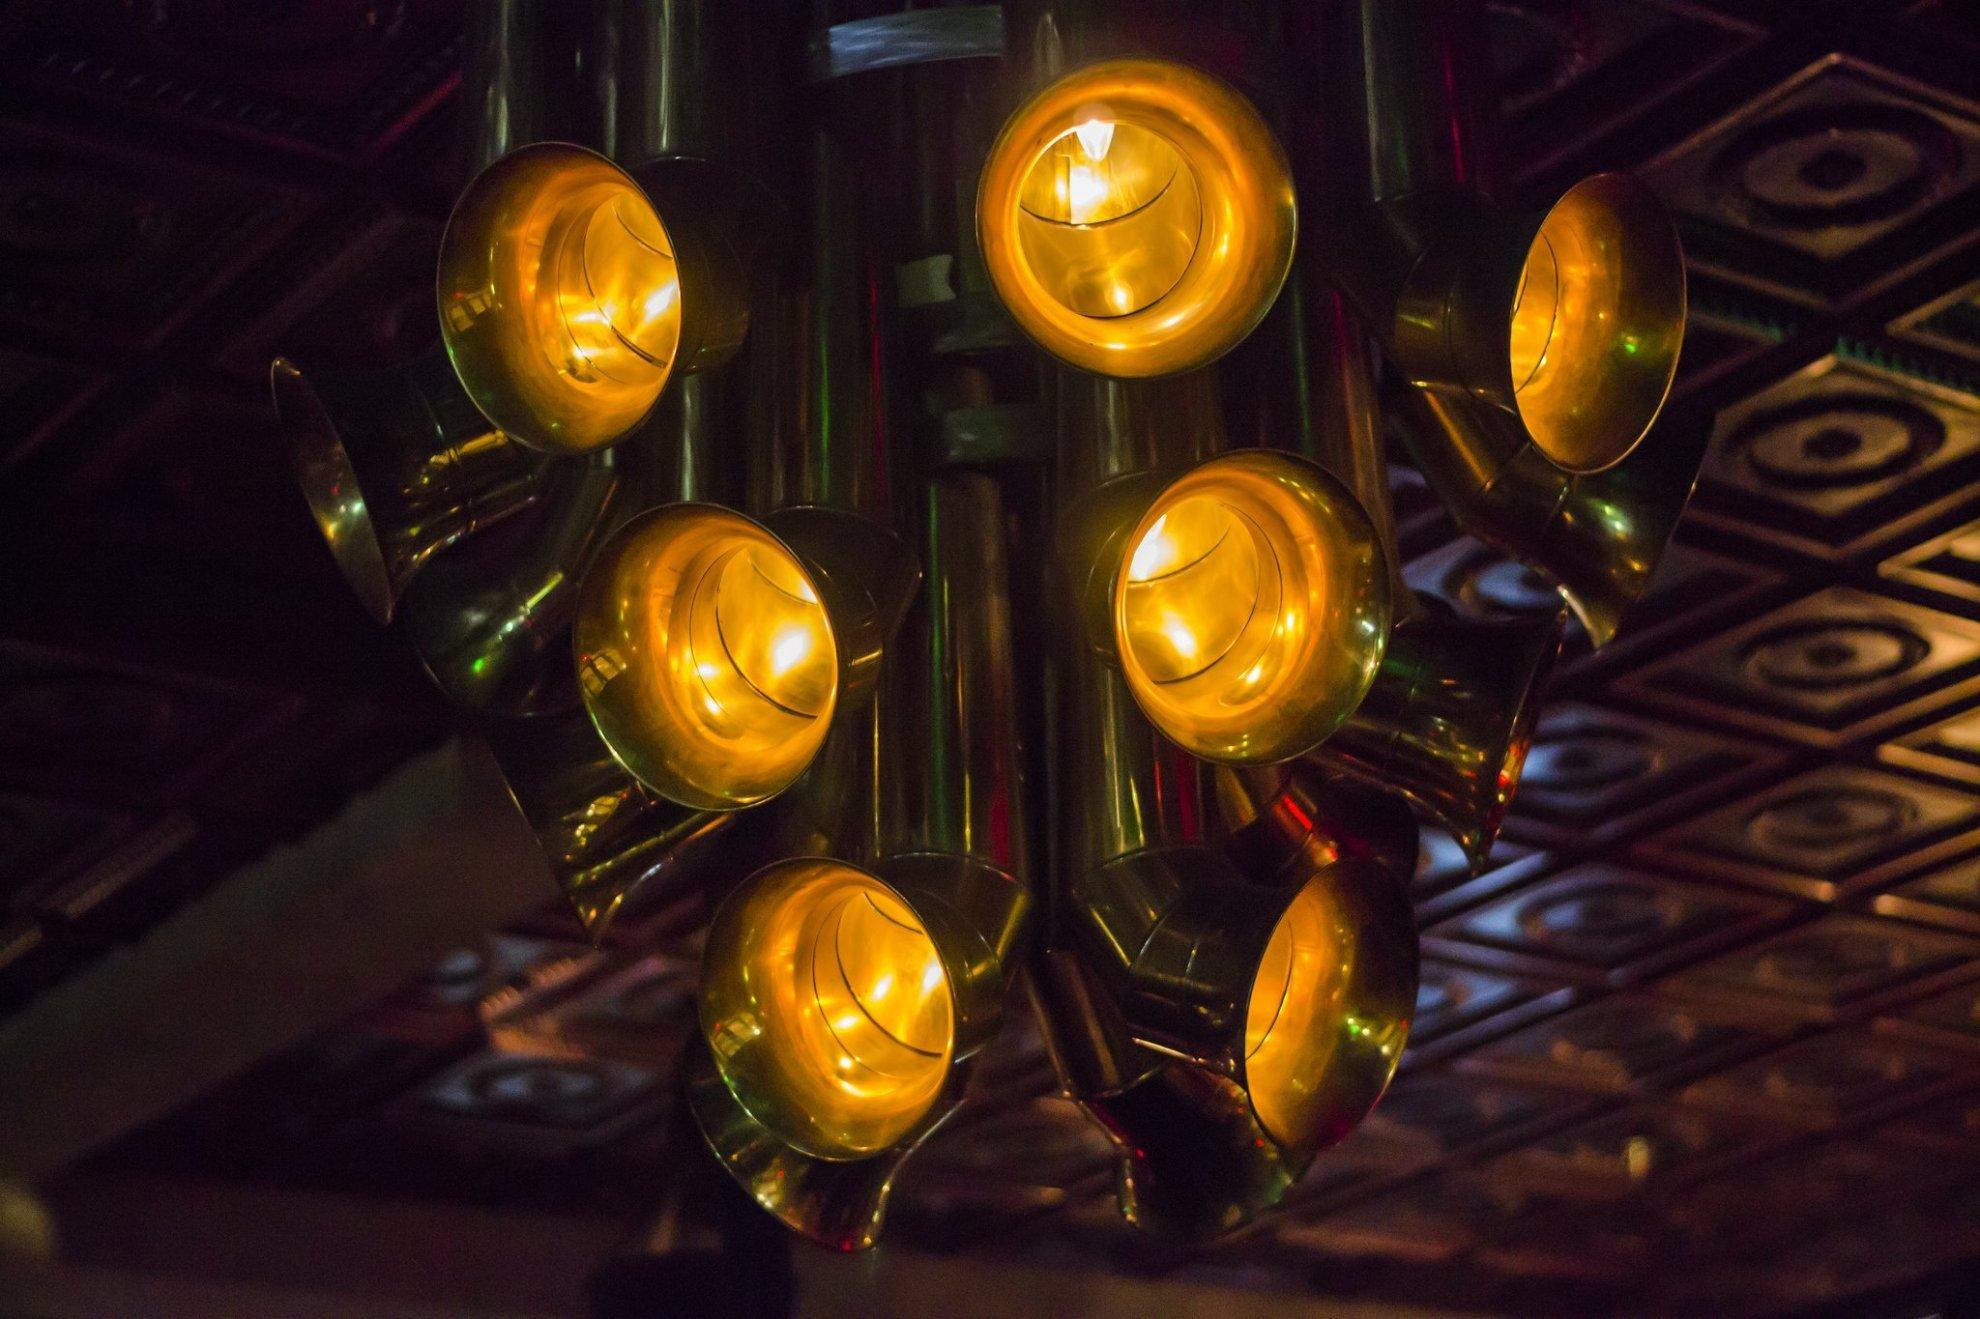 Instrumental Lights in The Blue's Kitchen | © MsSaraKelly / Flickr